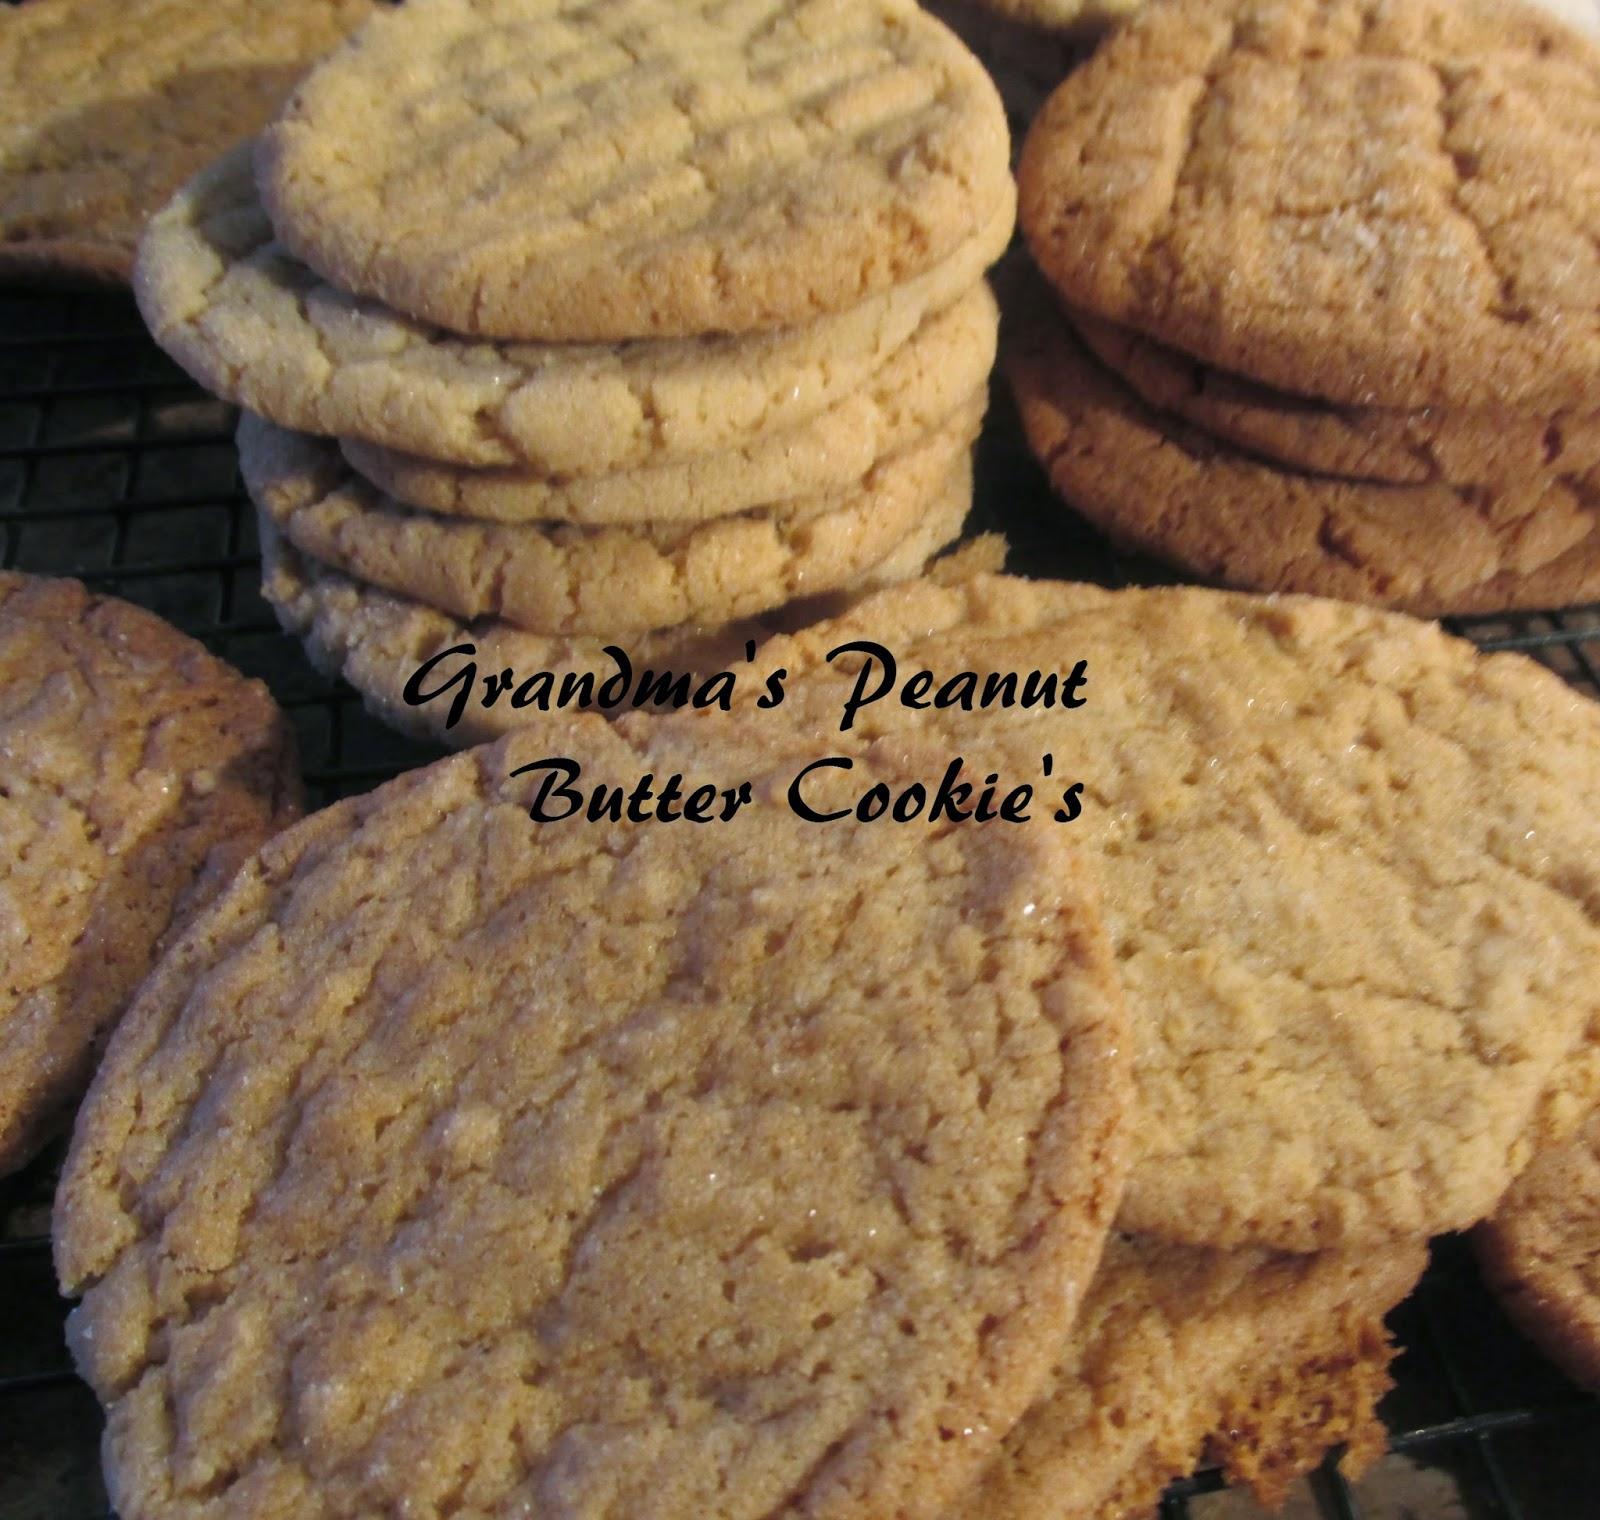 Grandma's Peanut Butter Cookie's